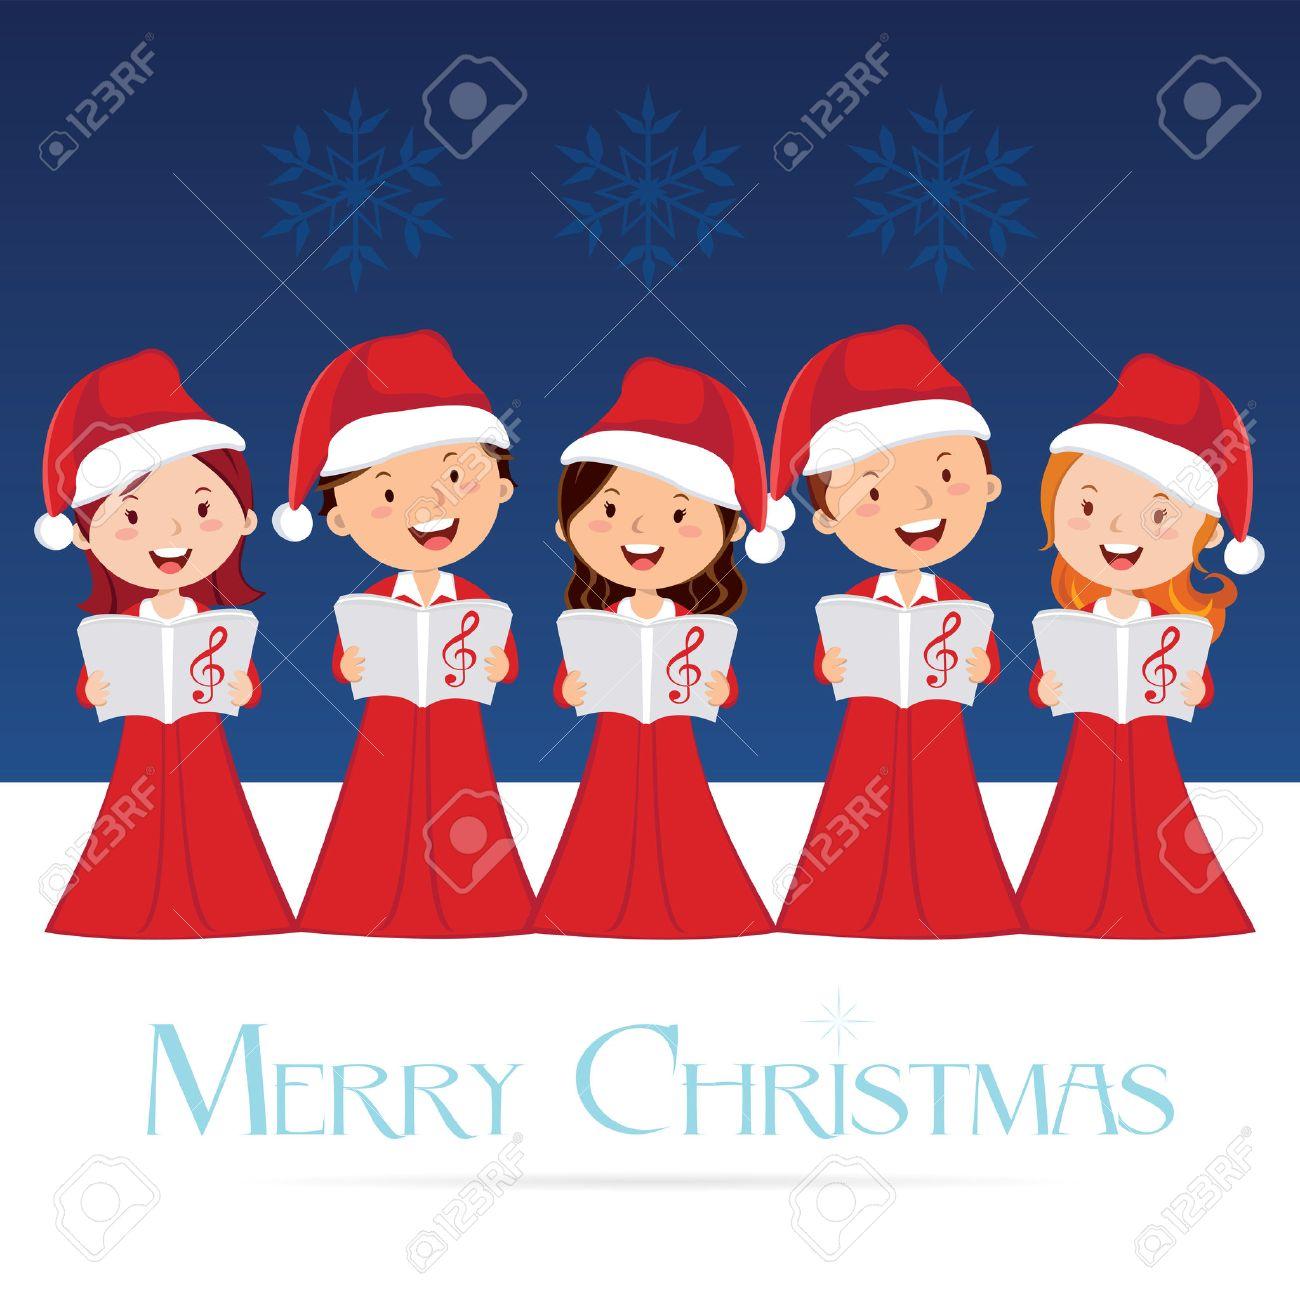 Christmas Choir.Choir Christmas Concert Christmas Carols